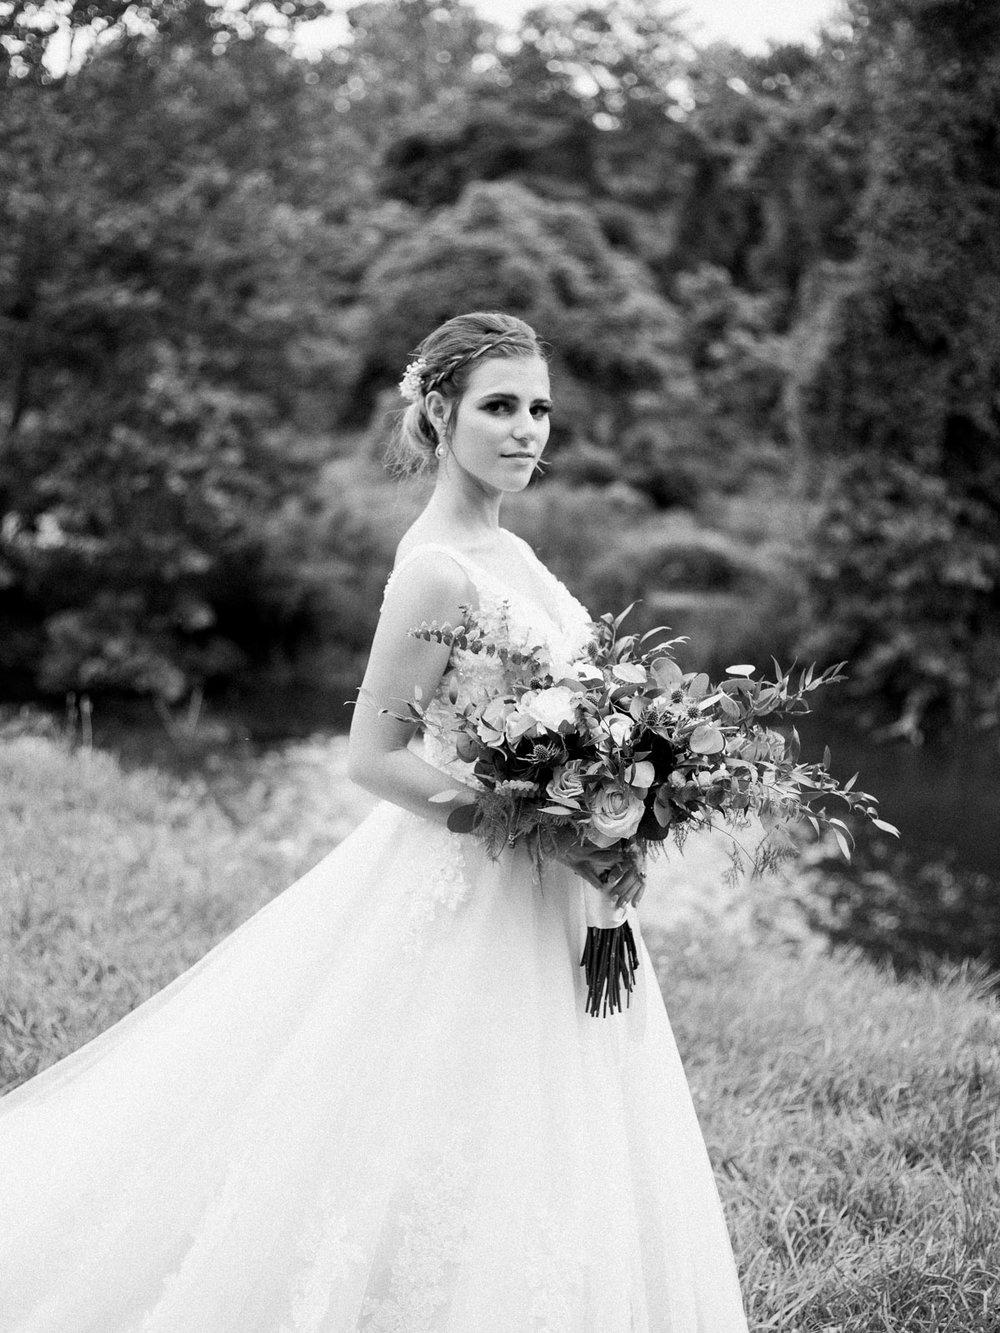 bohemian-akron-wedding-by-matt-erickson-photography-17.jpg